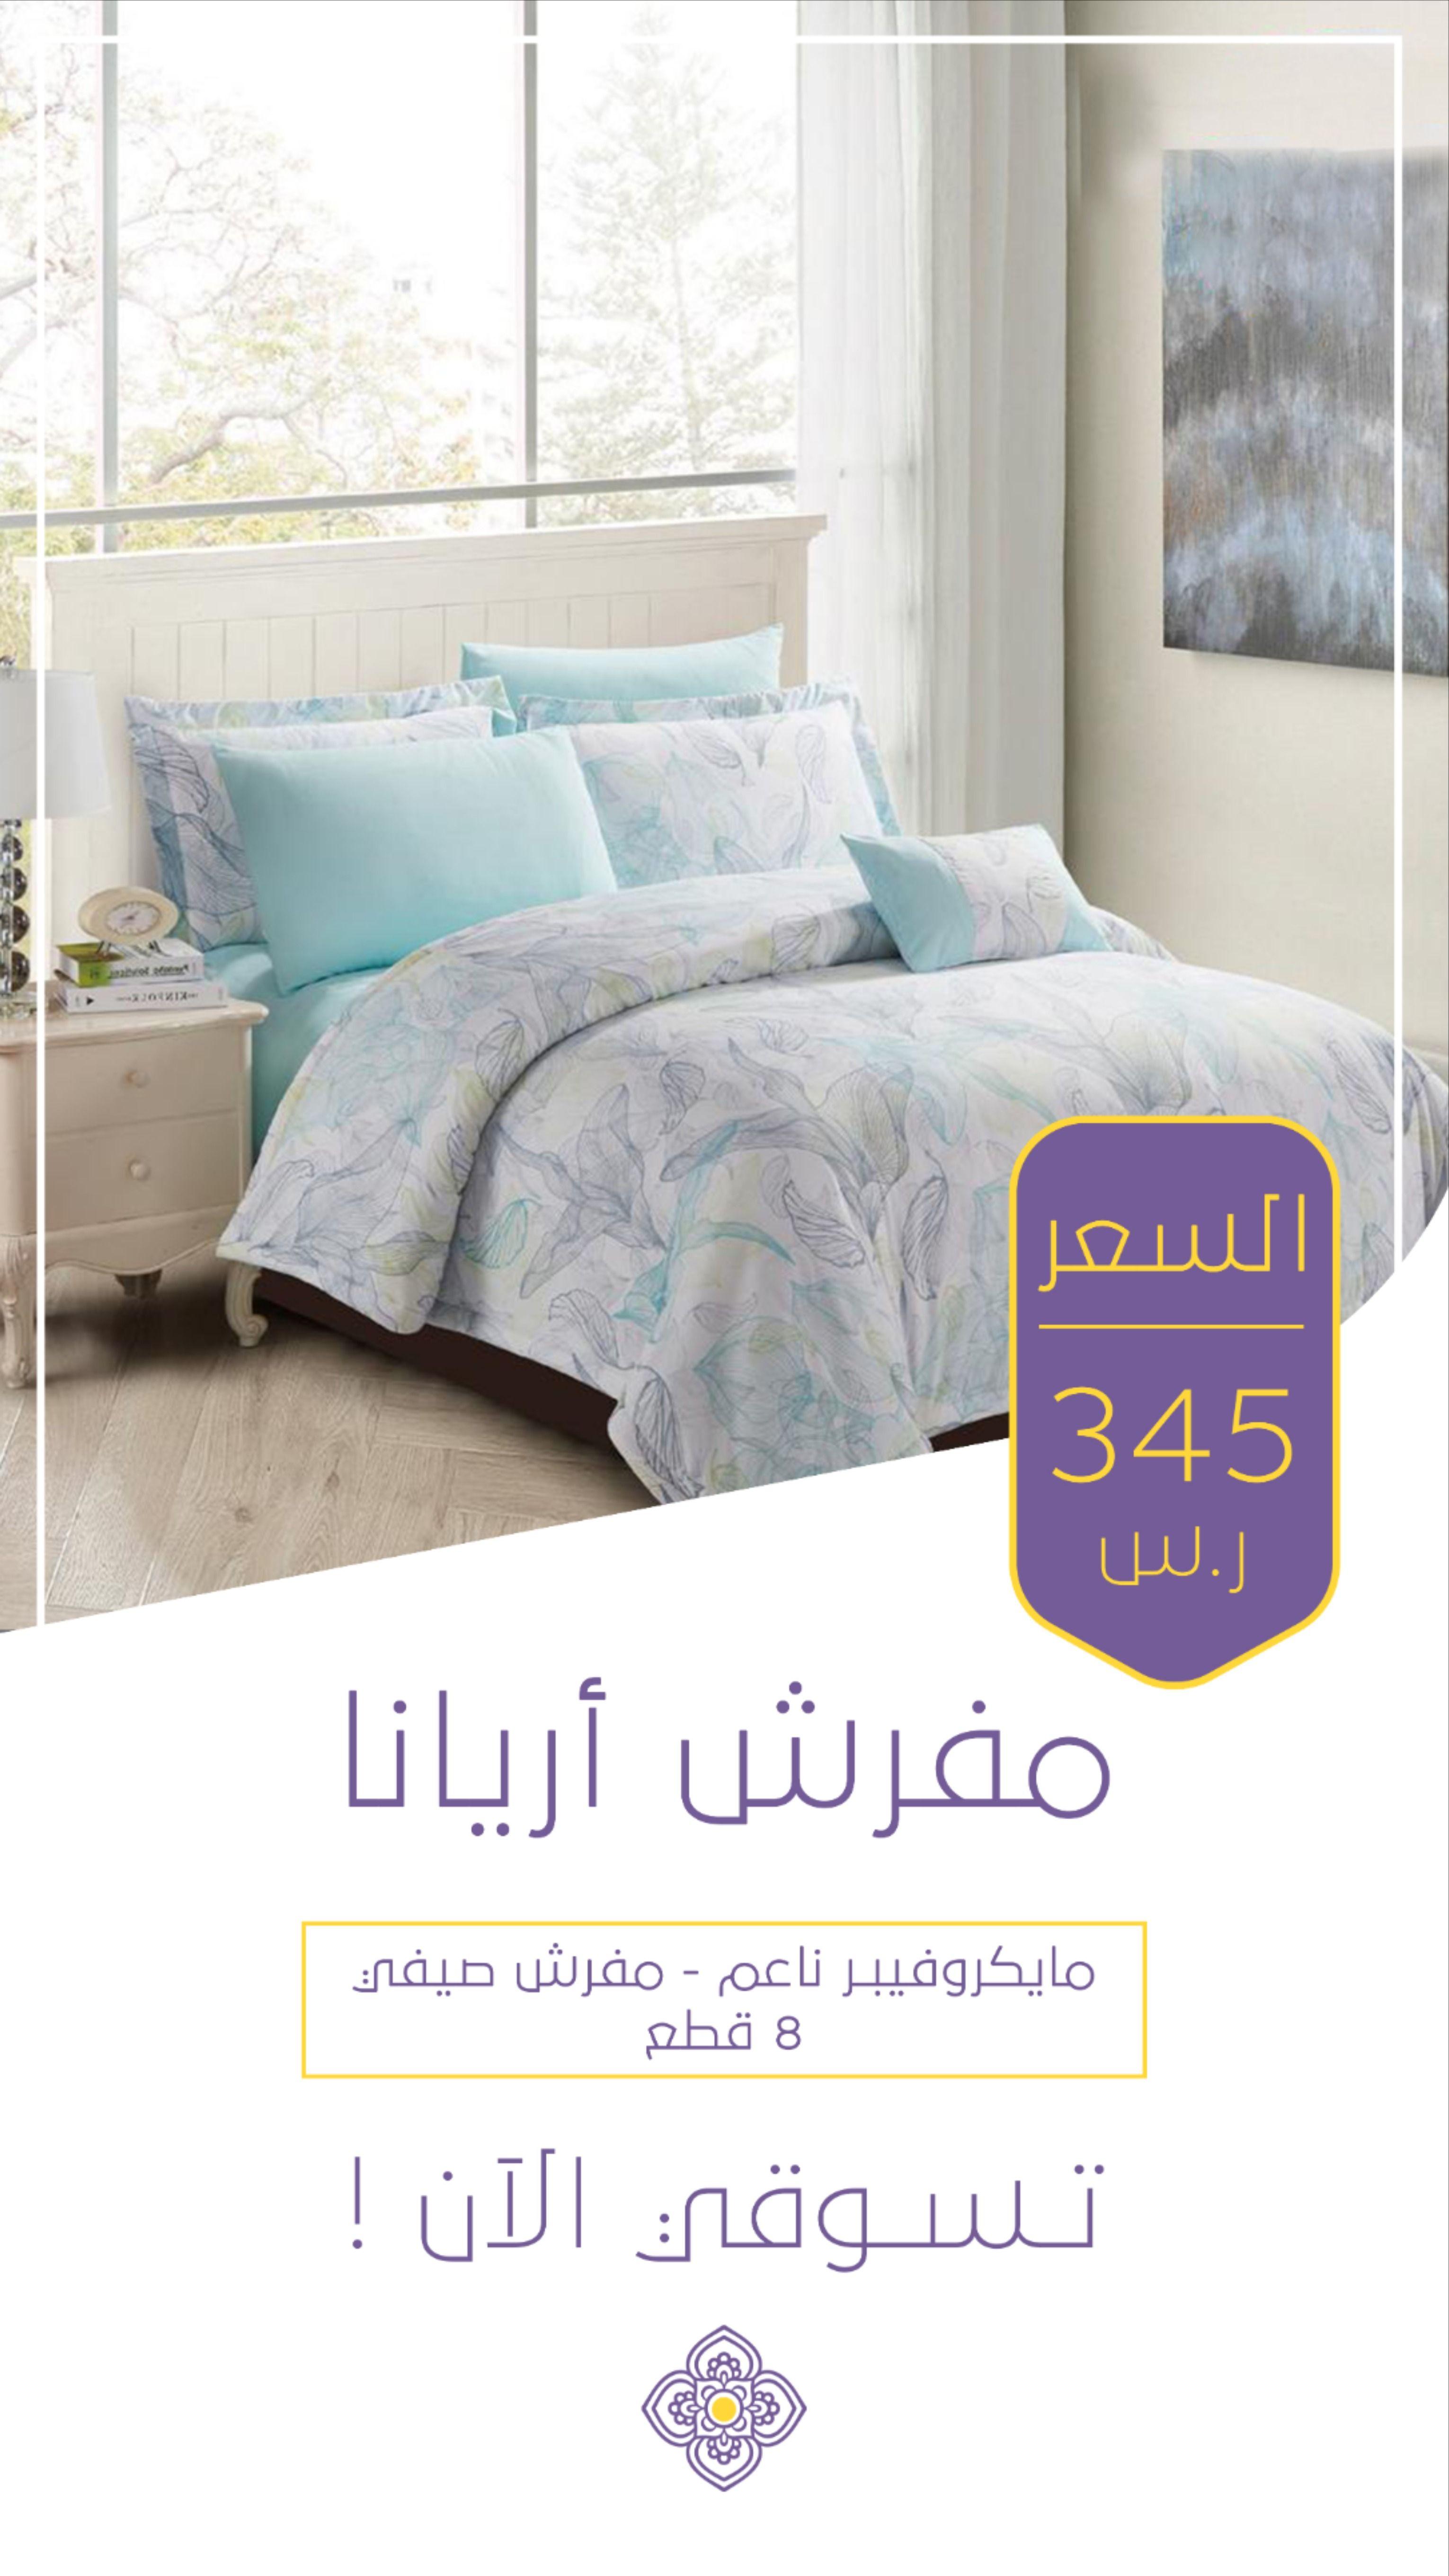 مفارش صيفية مفارش ميلين Bed Blanket Furniture